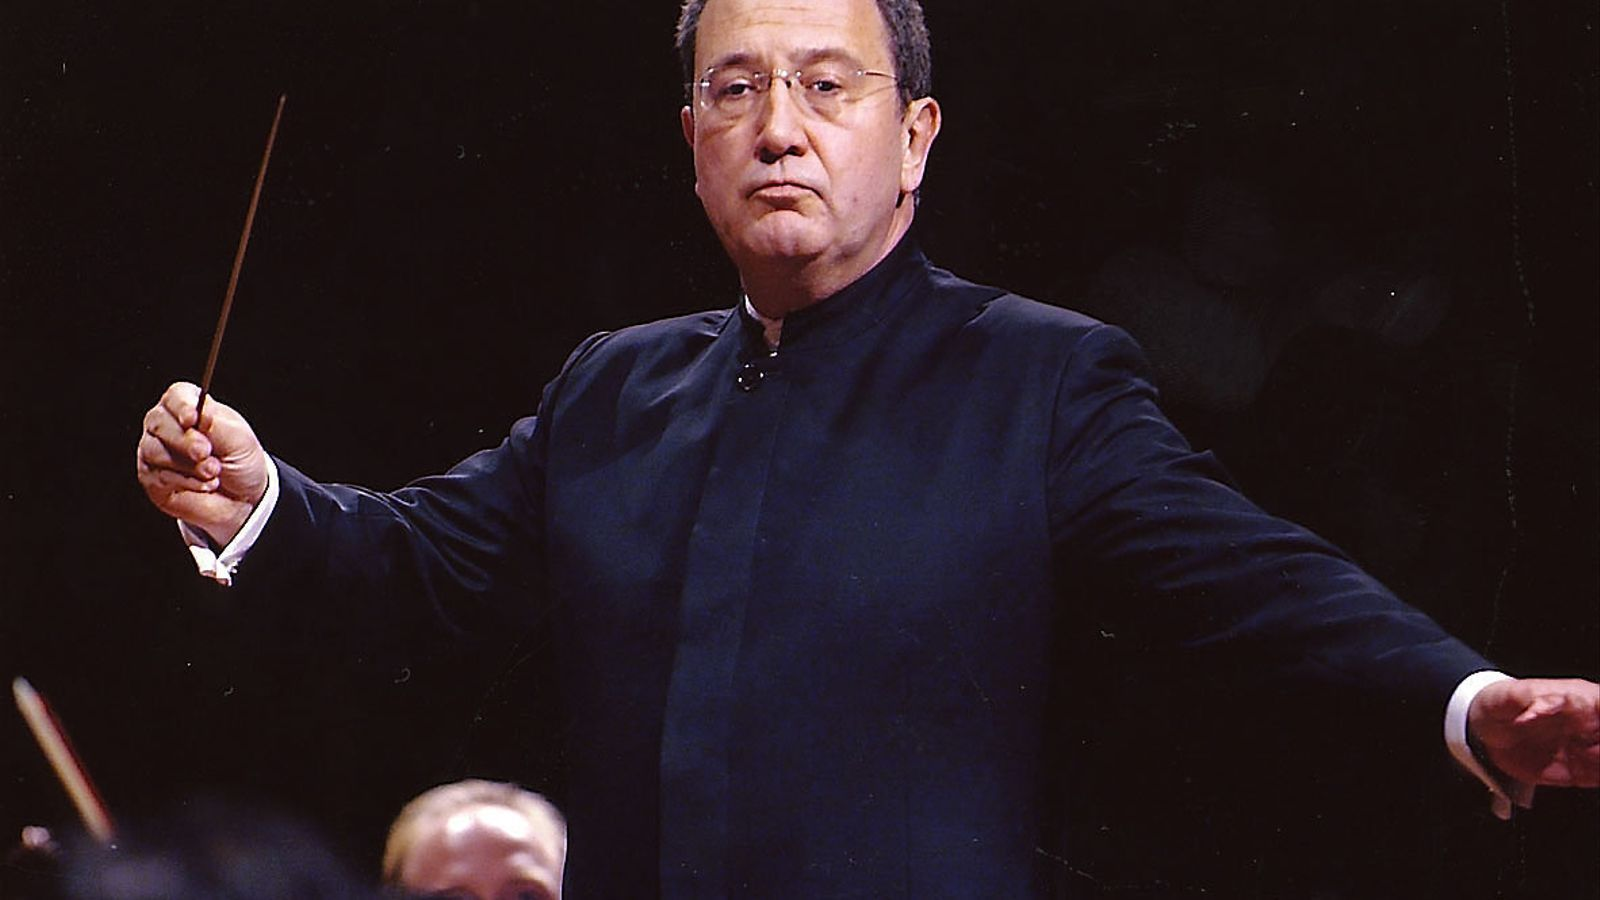 Salvador Mas, director convidat de la Camera Musicae. / OSCM